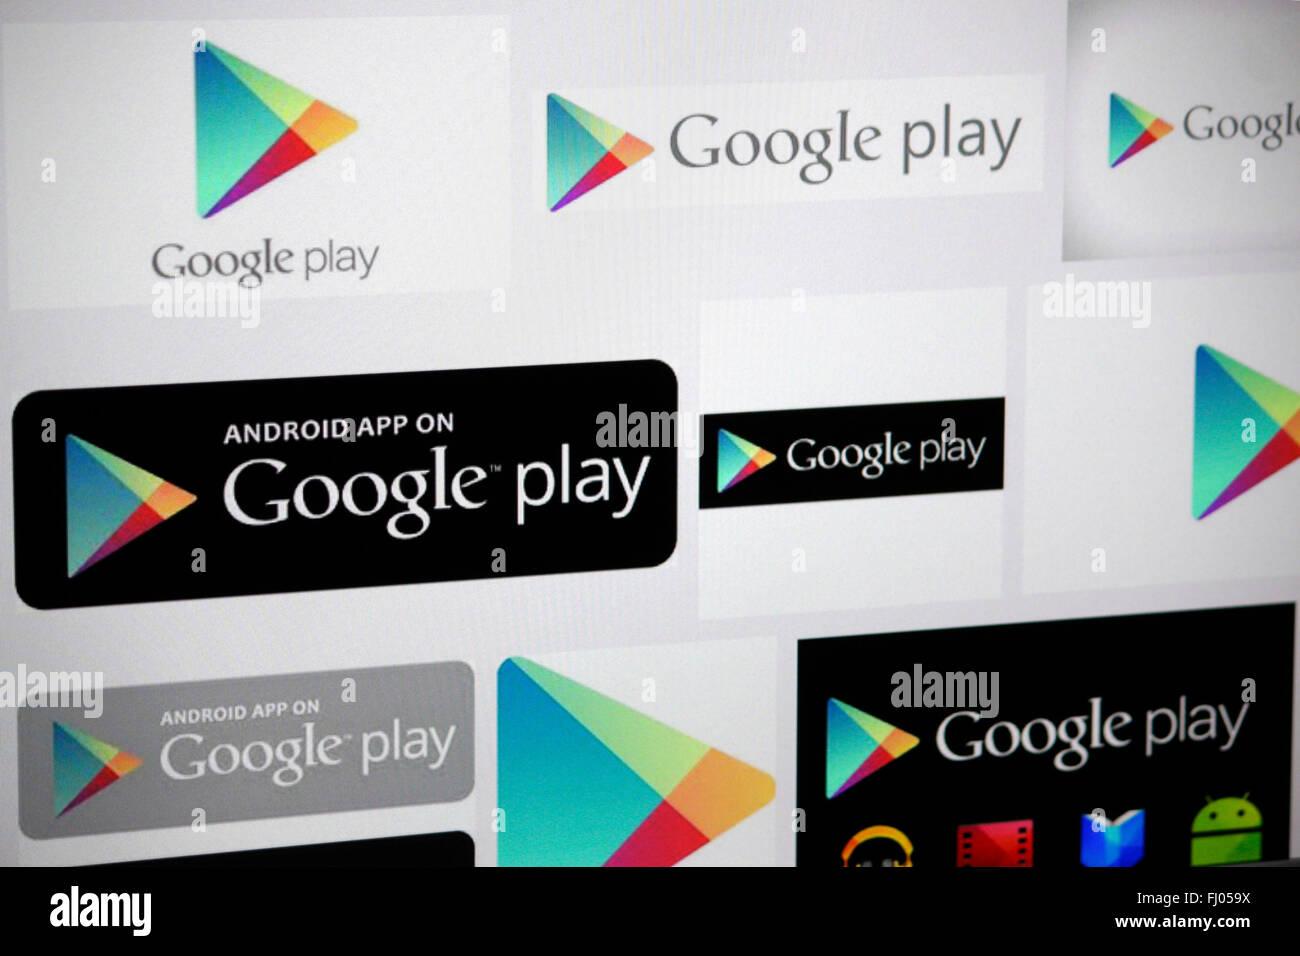 Markenname: 'Google Play', de Berlín. Foto de stock